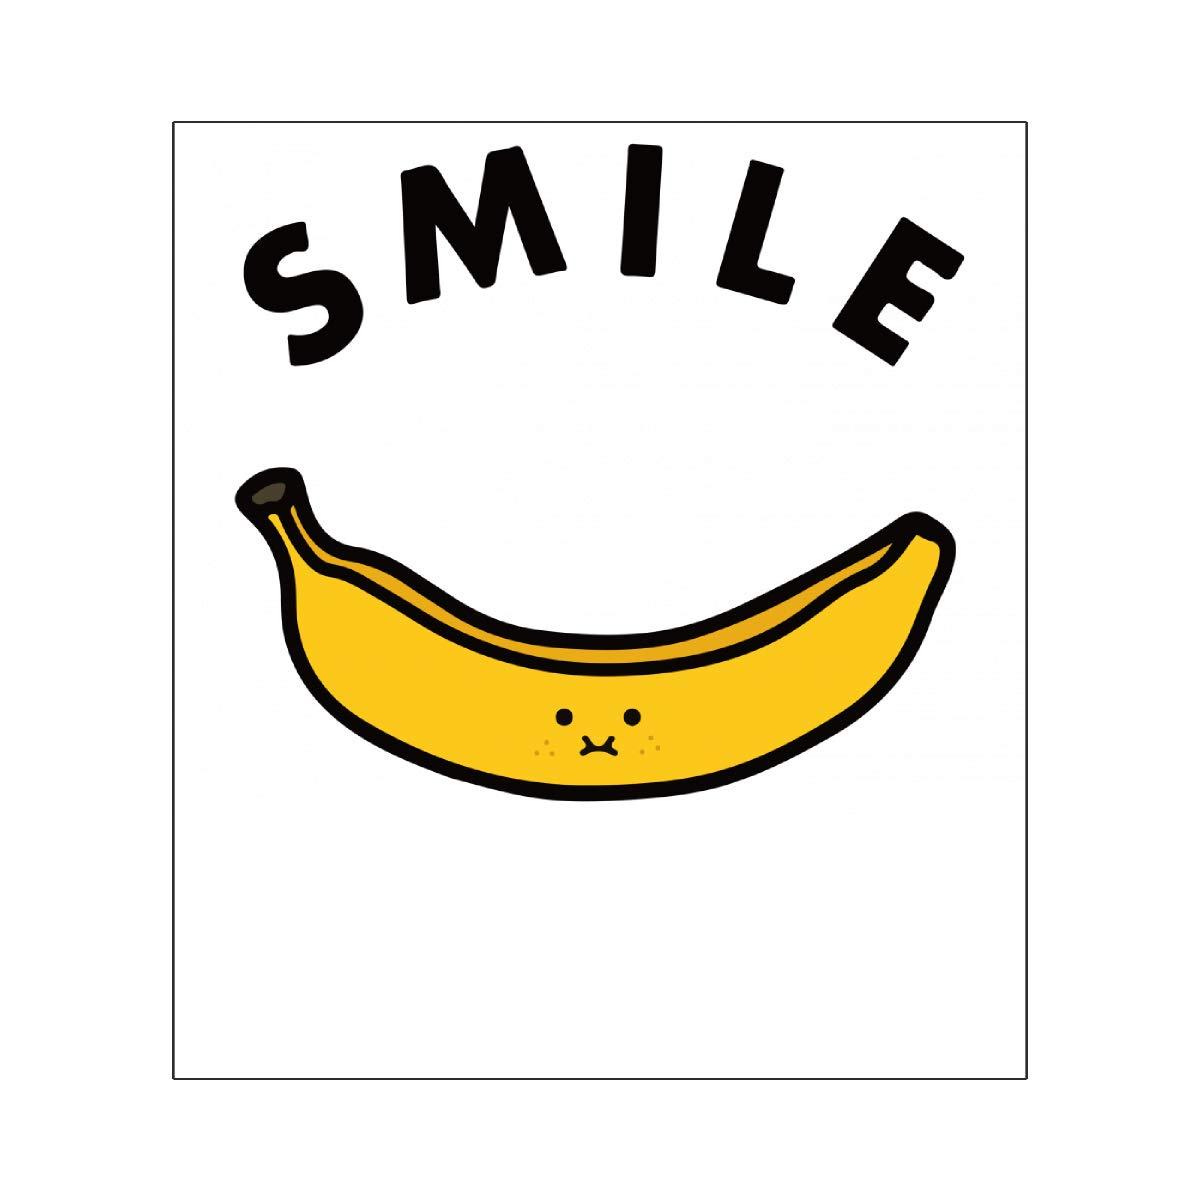 Harataki Smile Banana Unisex-Baby Newborn Short-Sleeve Bodysuit Rompers